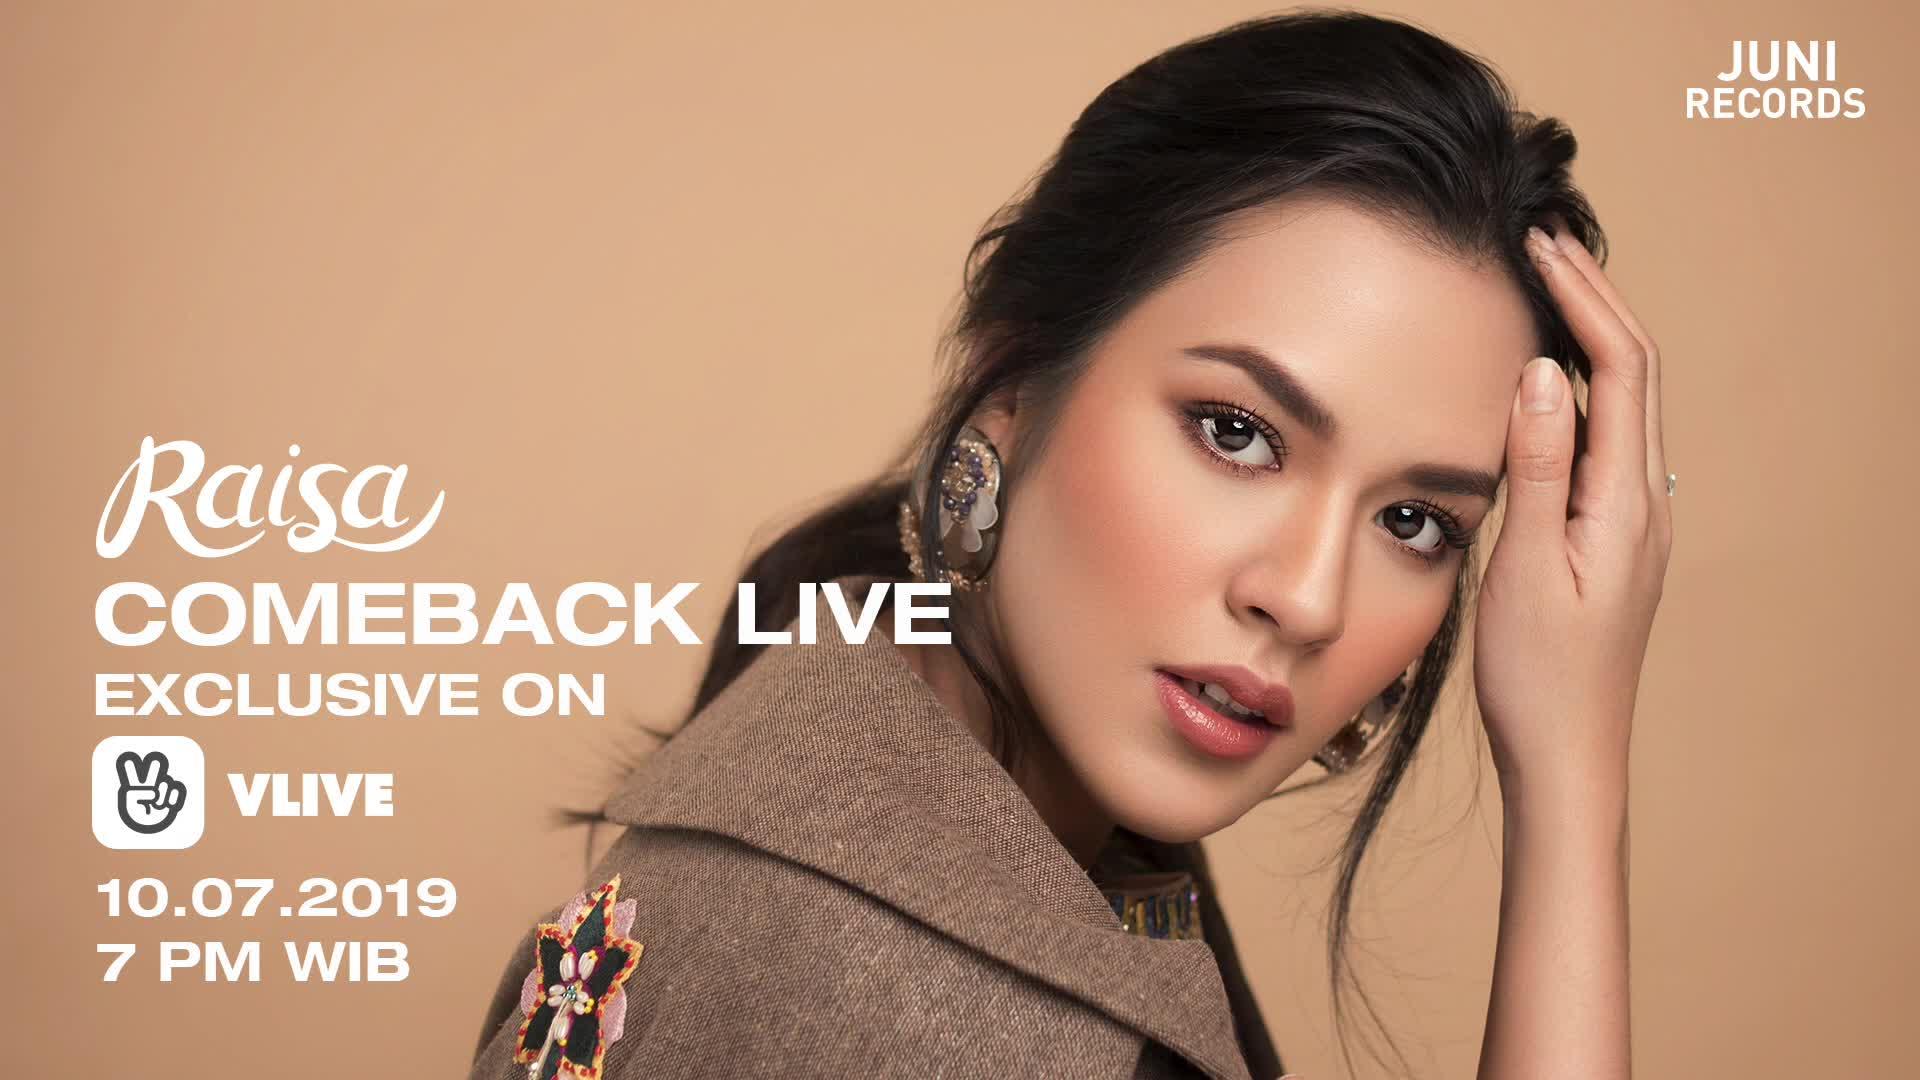 How to Enjoy RAISA Comeback Live on V LIVE (by RAISA)